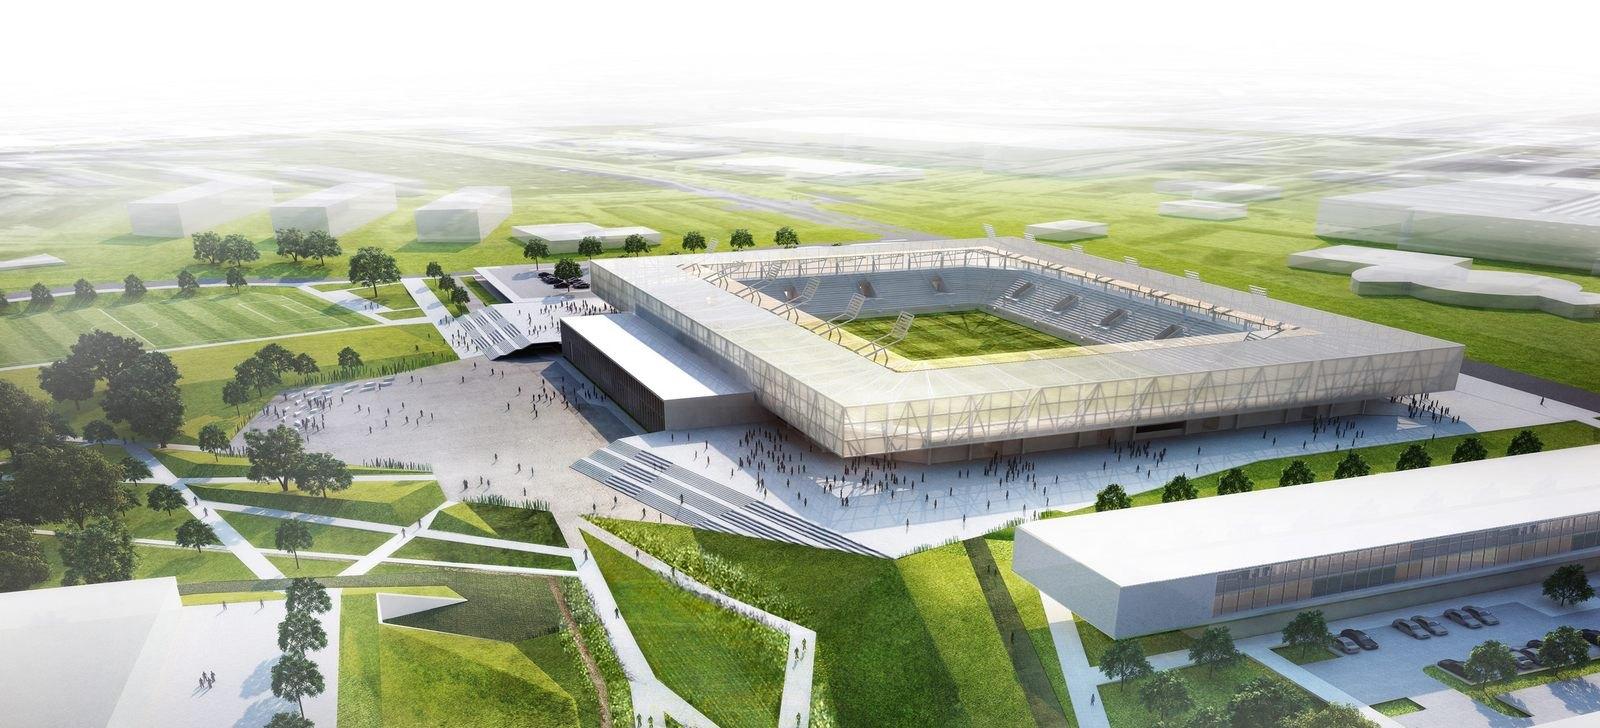 Stadion Stomilu Olsztyn